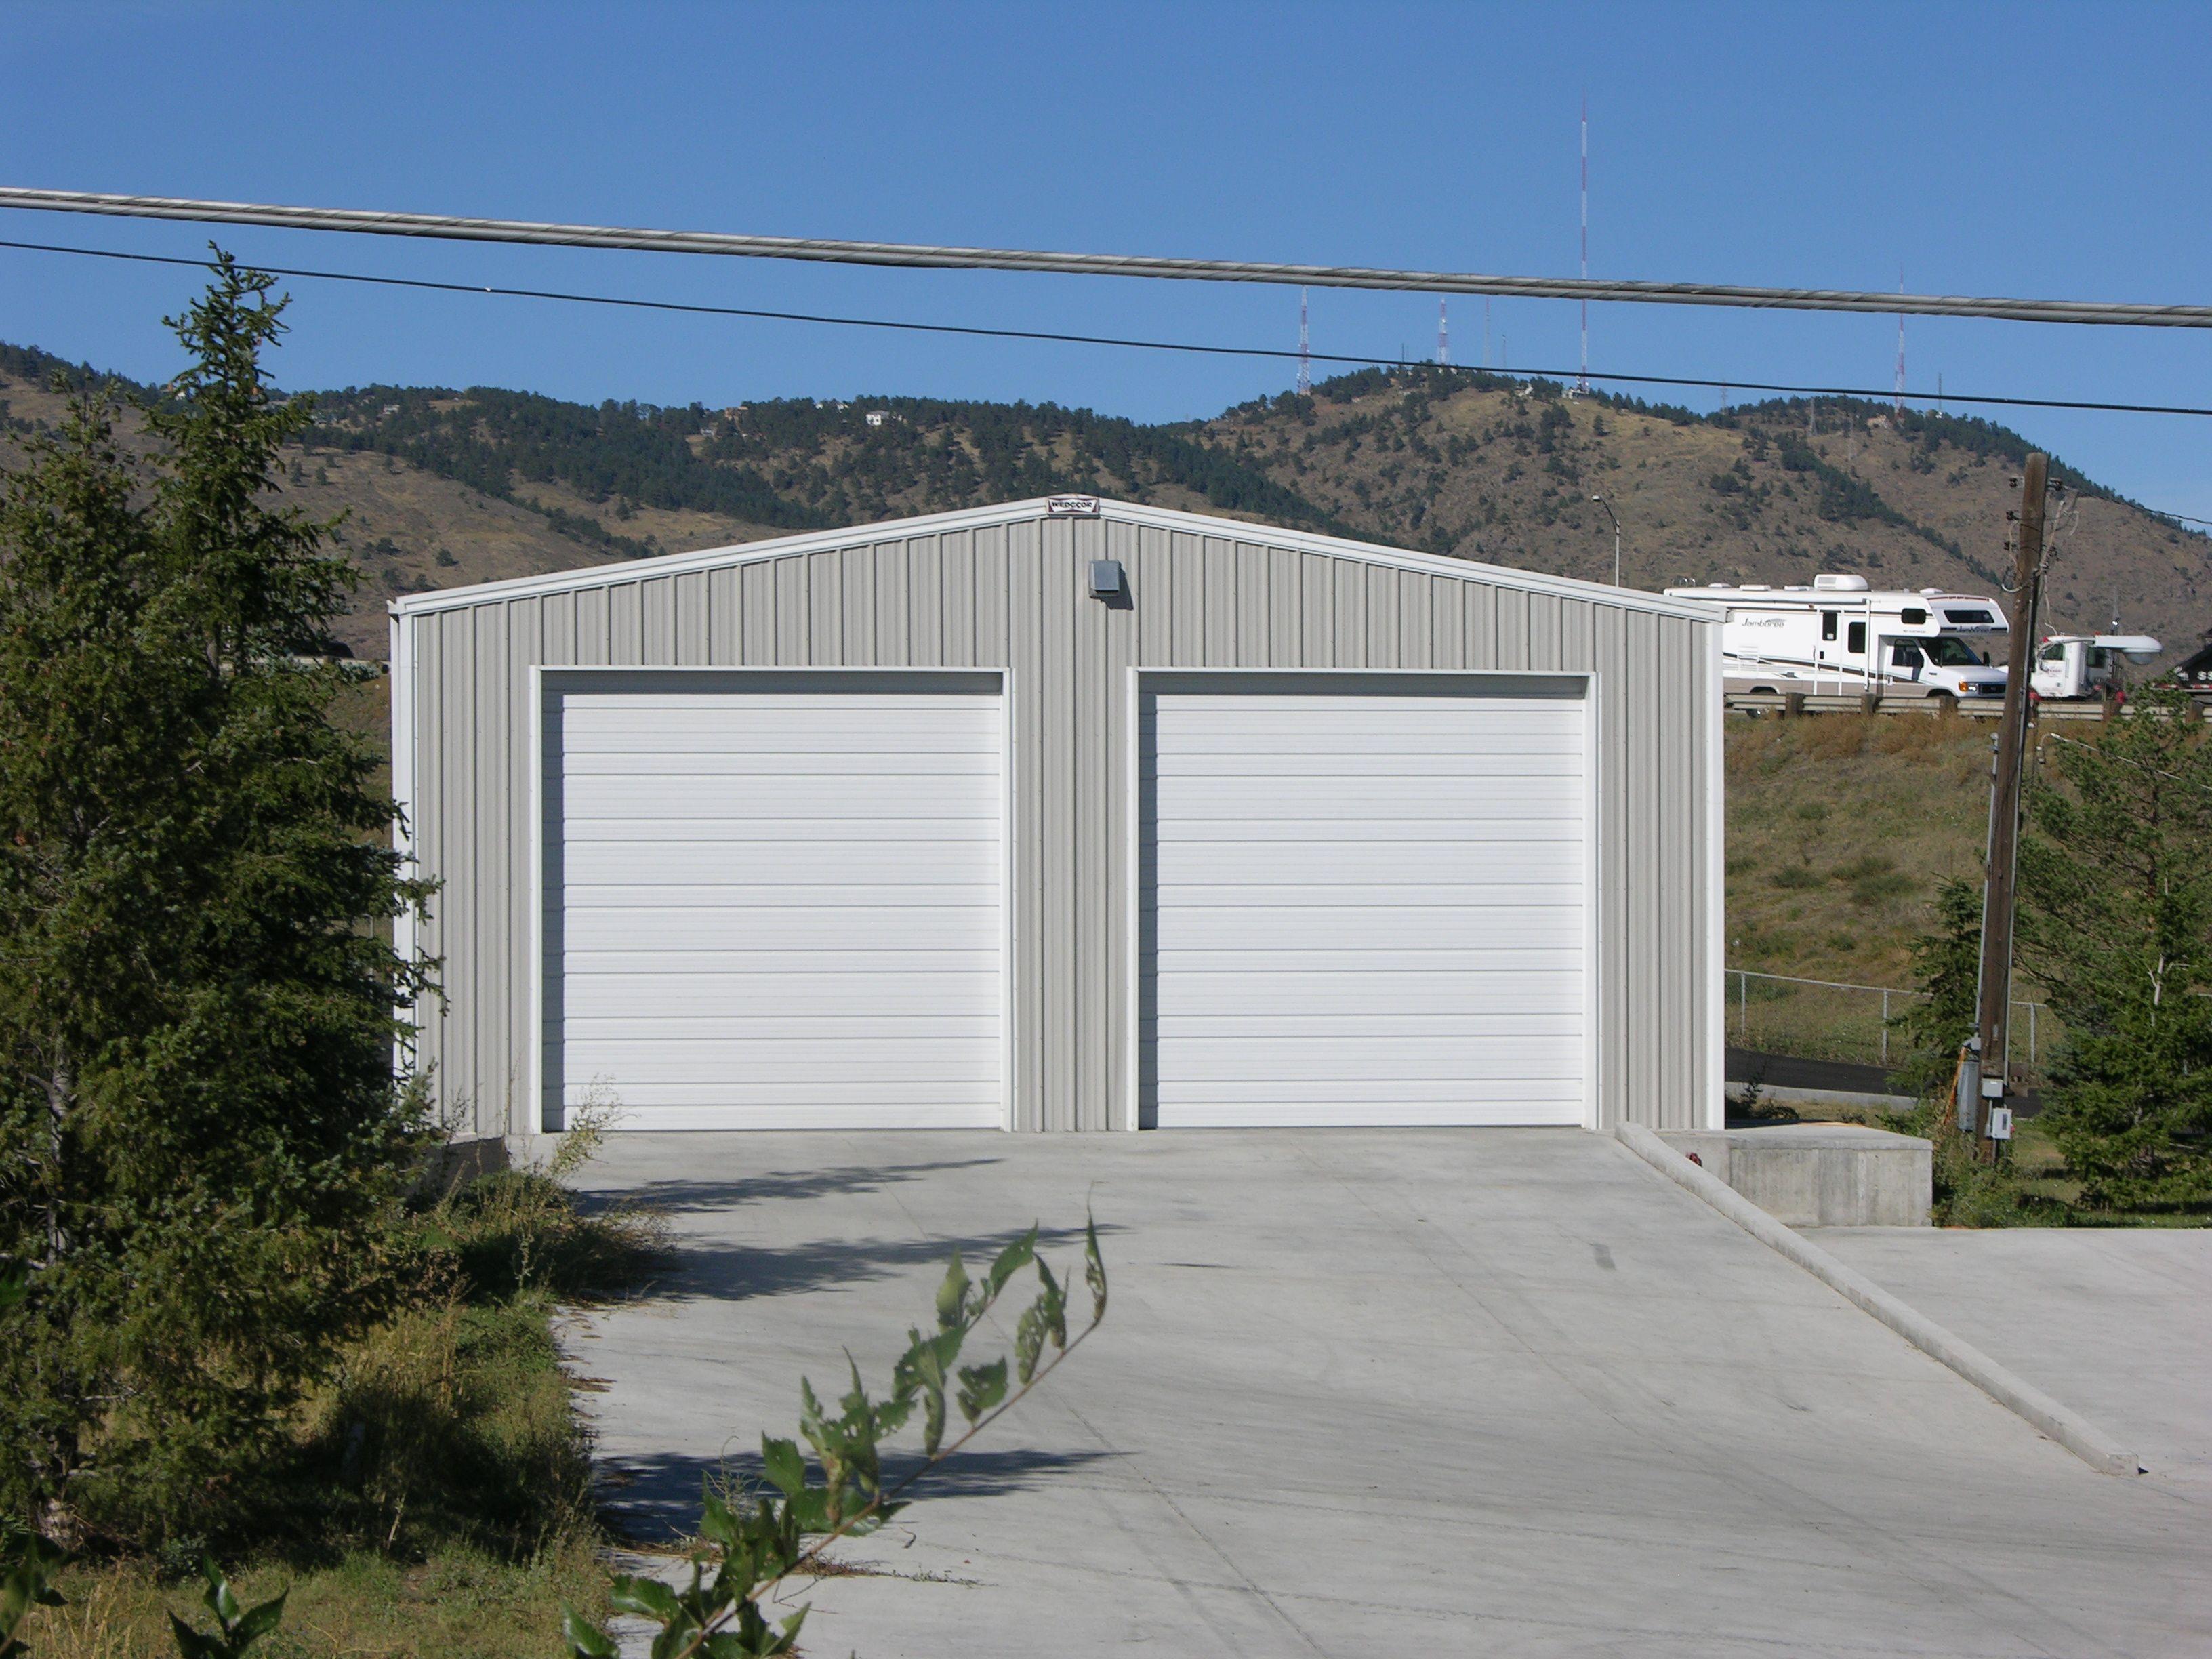 National Supplier of Commercial Overhead Doors Sectional Doors and Overhead Garage Doors. Price Your & National Supplier of Commercial Overhead Doors Sectional Doors ... pezcame.com